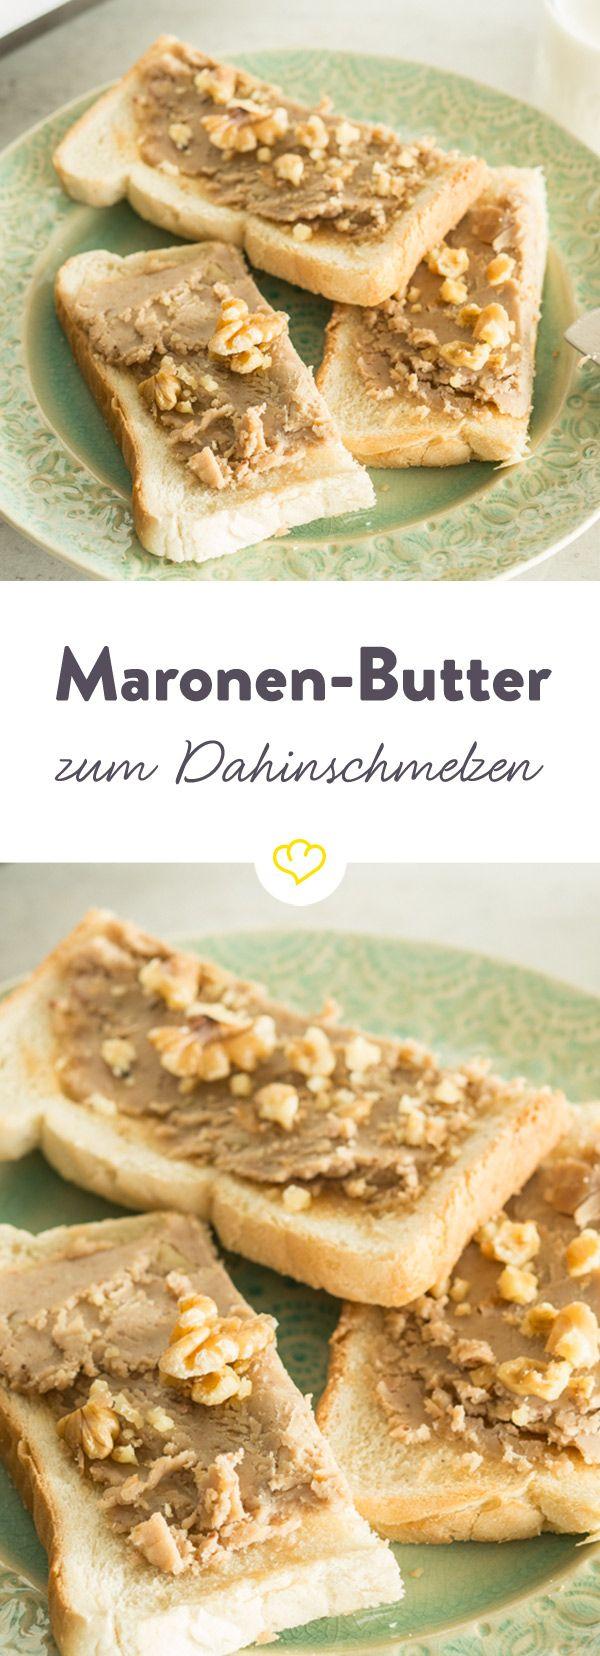 Maronen-Butter